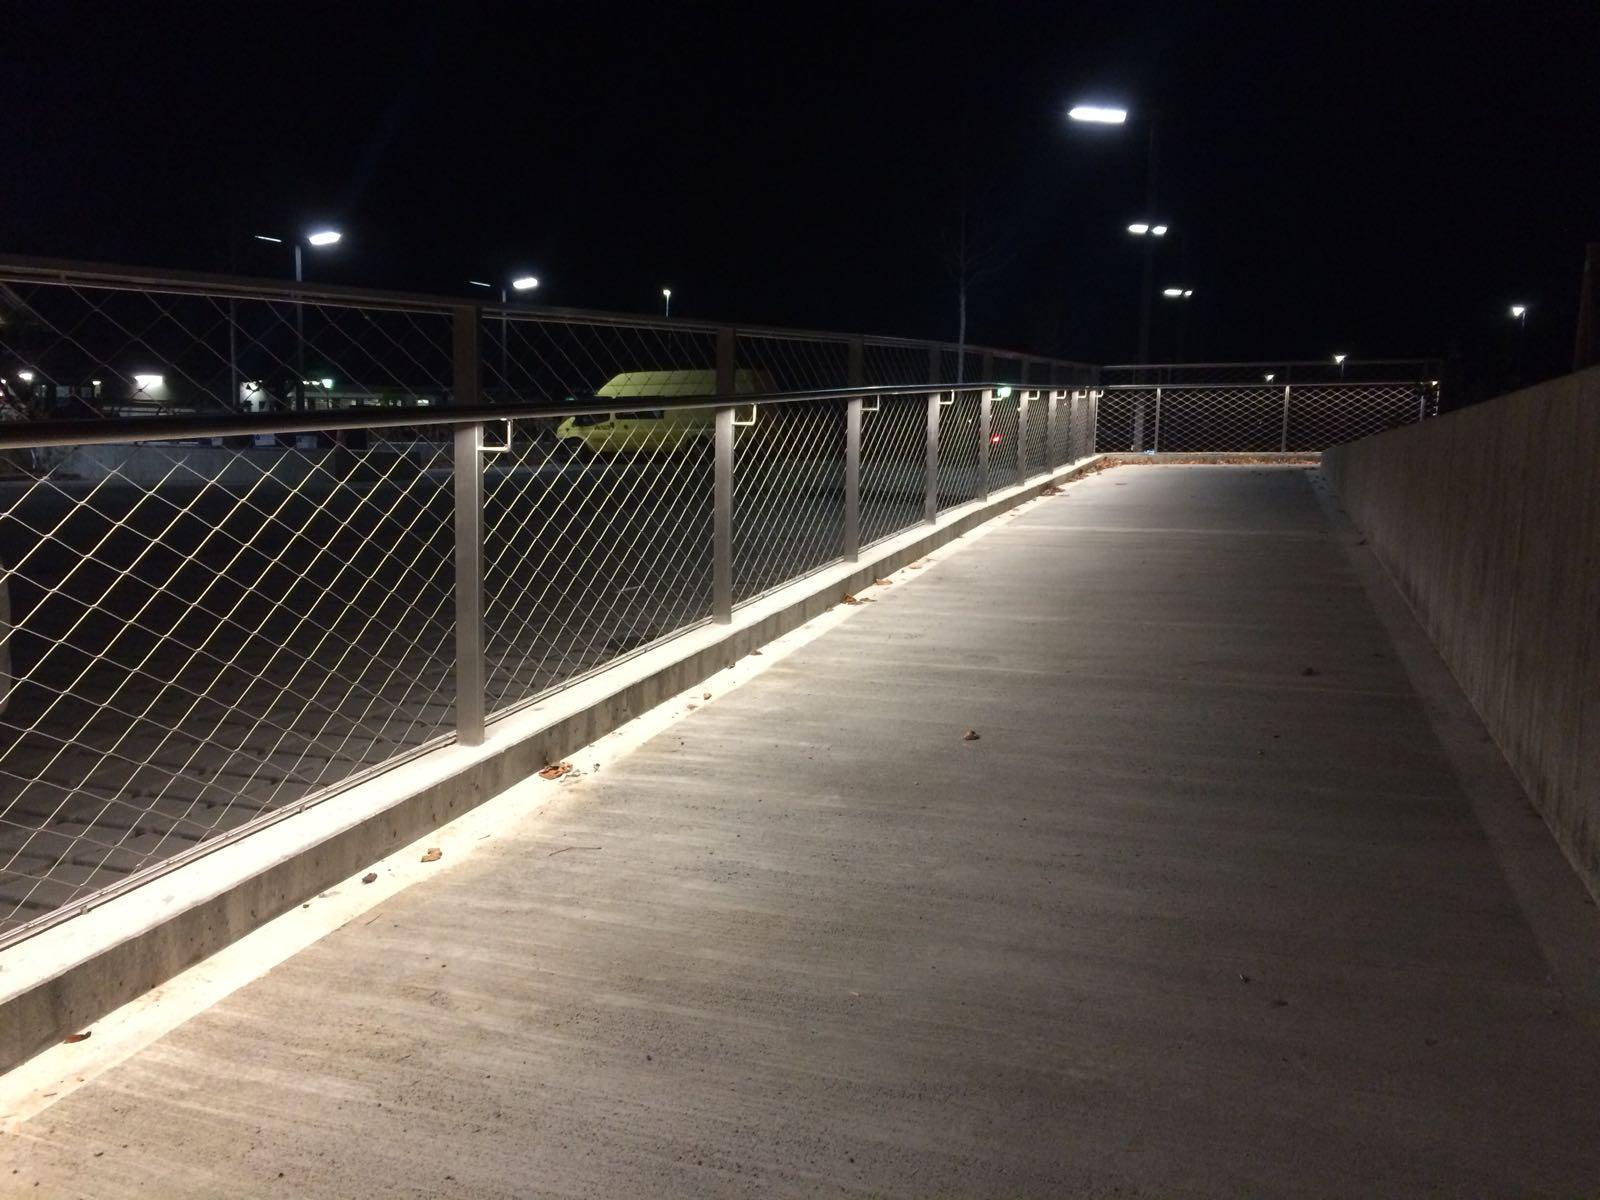 CNS-Handlauf mit LED